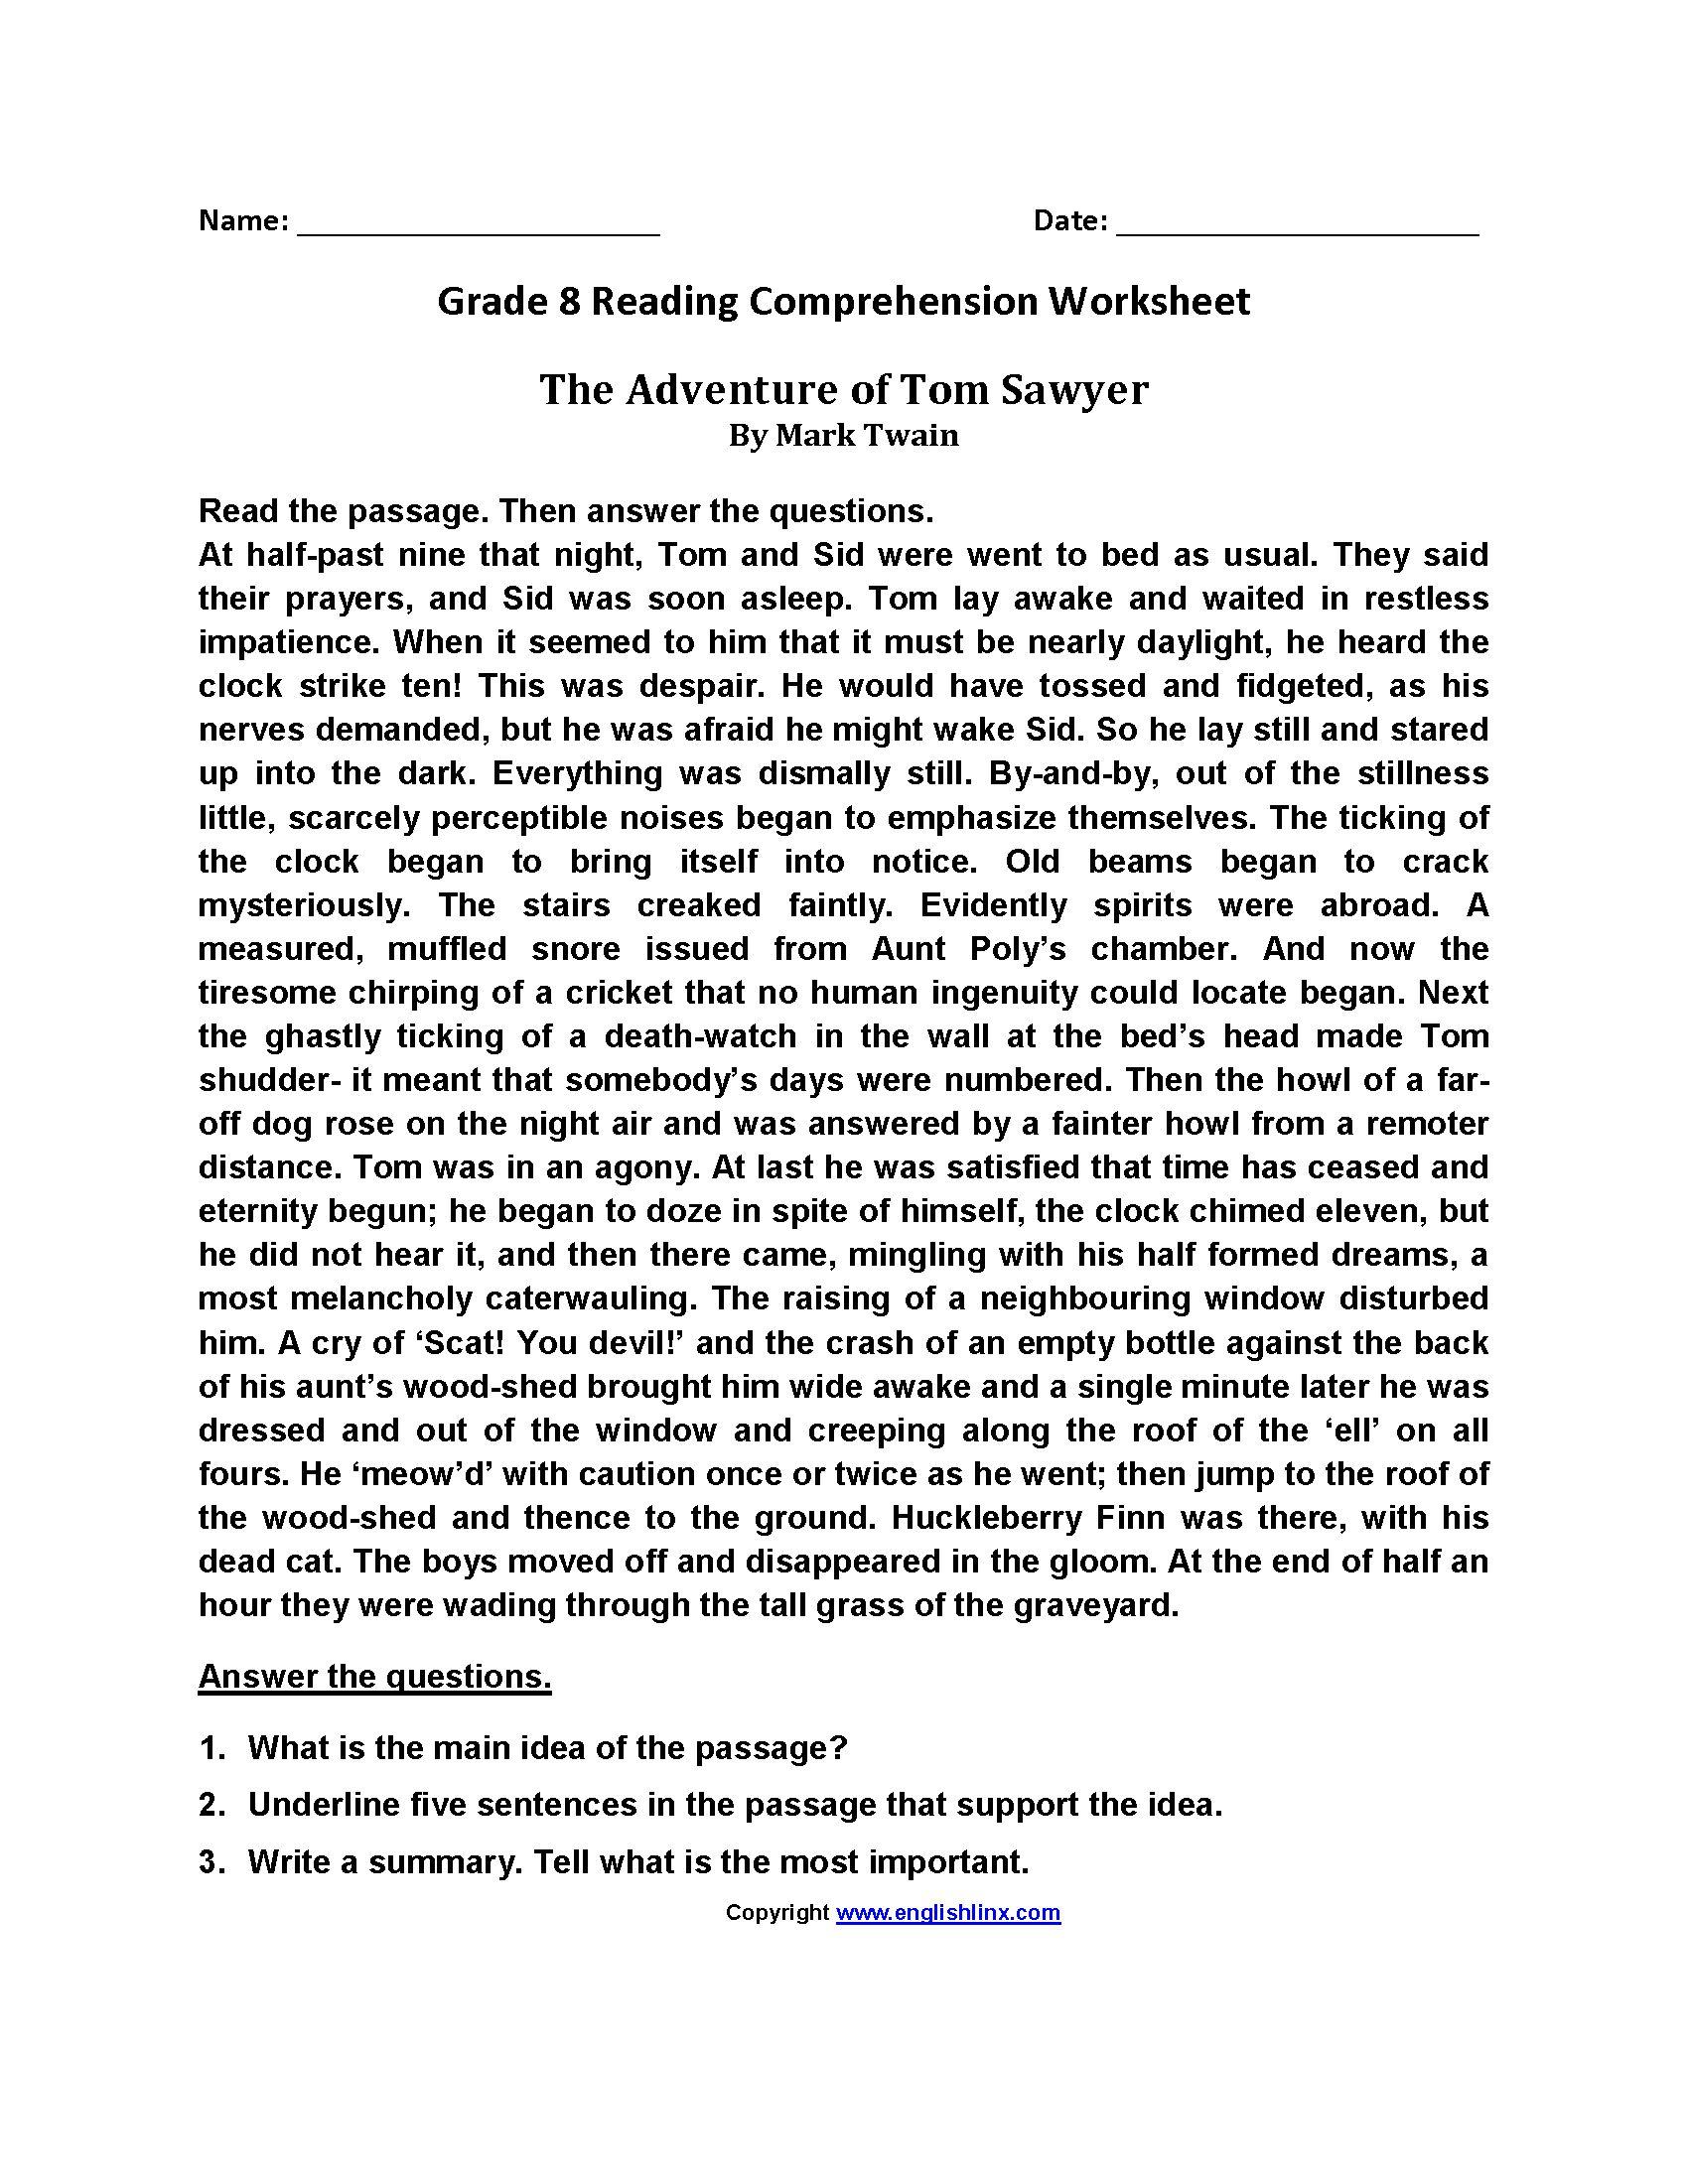 Reading Comprehension High School Worksheets Pdf Excelguider Com In 2020 Comprehension Worksheets Reading Worksheets Reading Comprehension